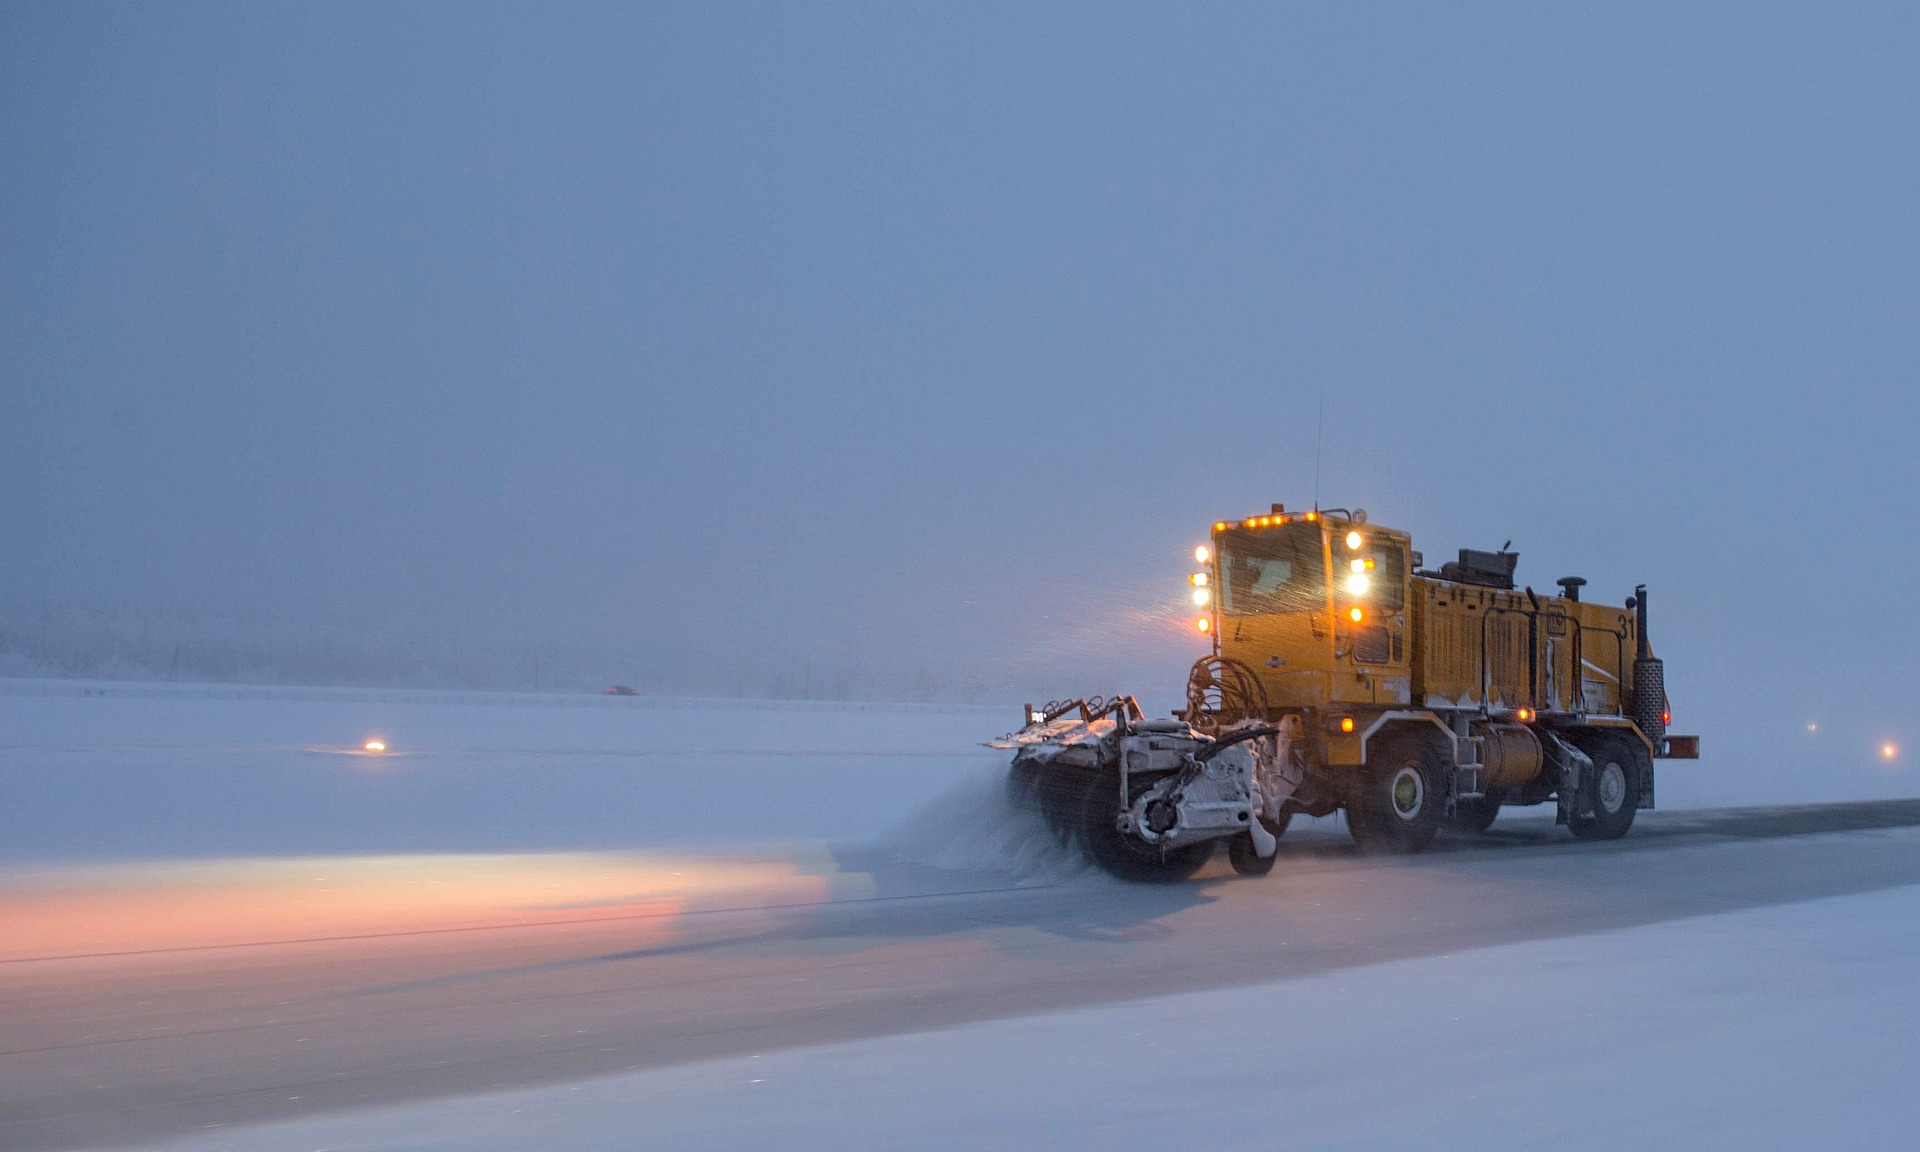 snowplow-1168280_1920